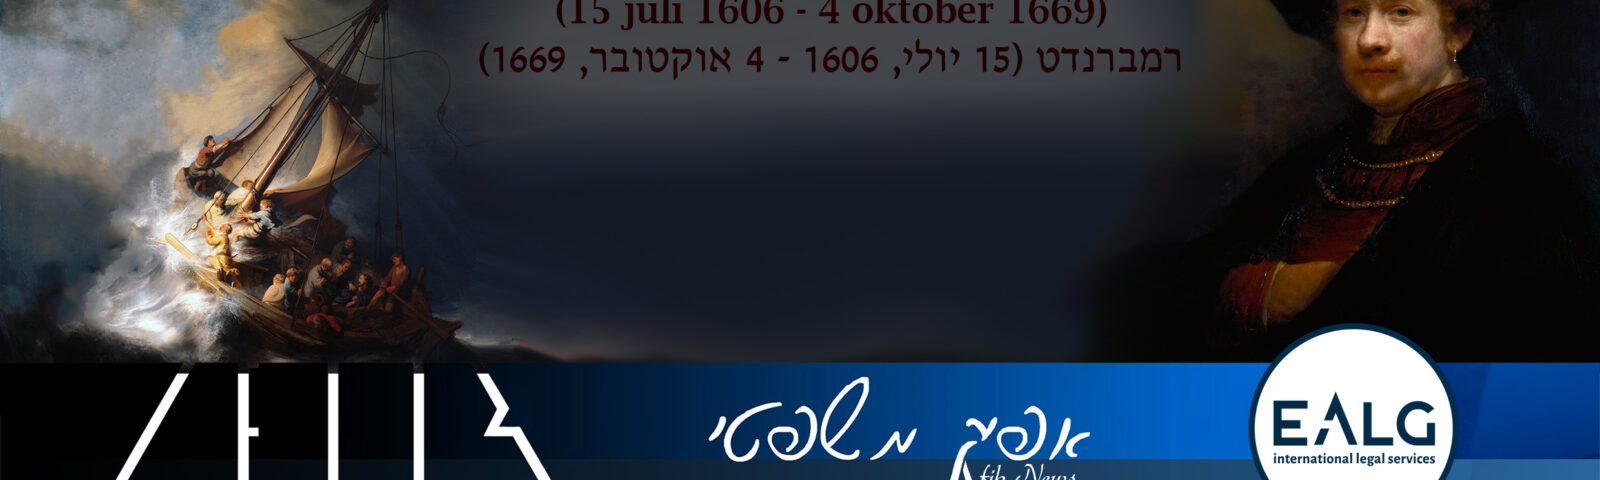 Afik News 313 15.07.2020